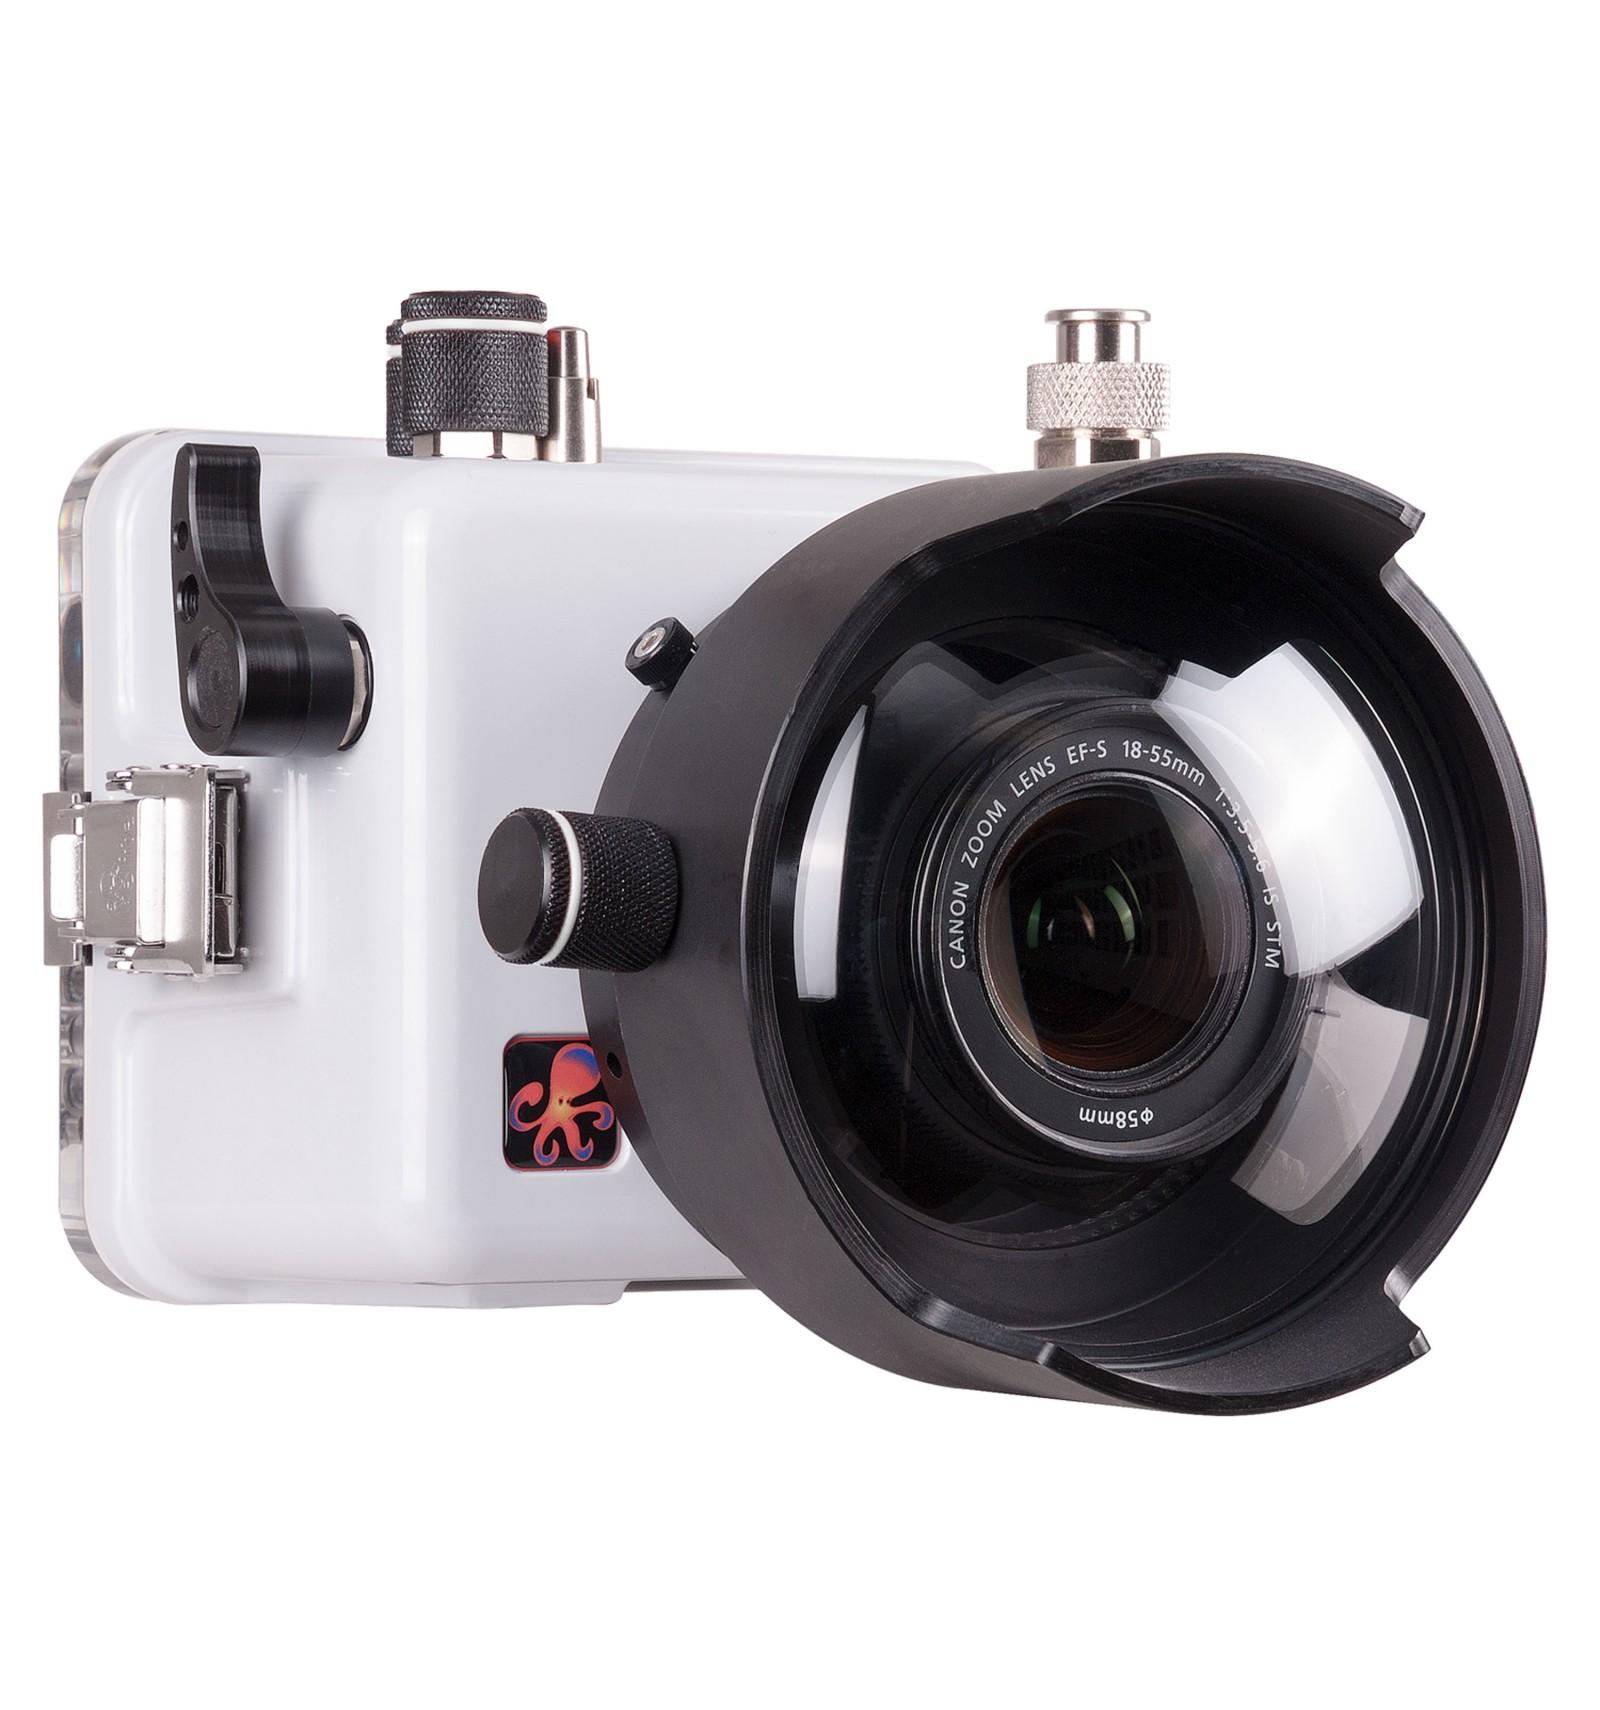 Housing For Canon Eos 100d Rebel Sl1 White Danish Divers A S Kit 18 55 Is Stm 100 D